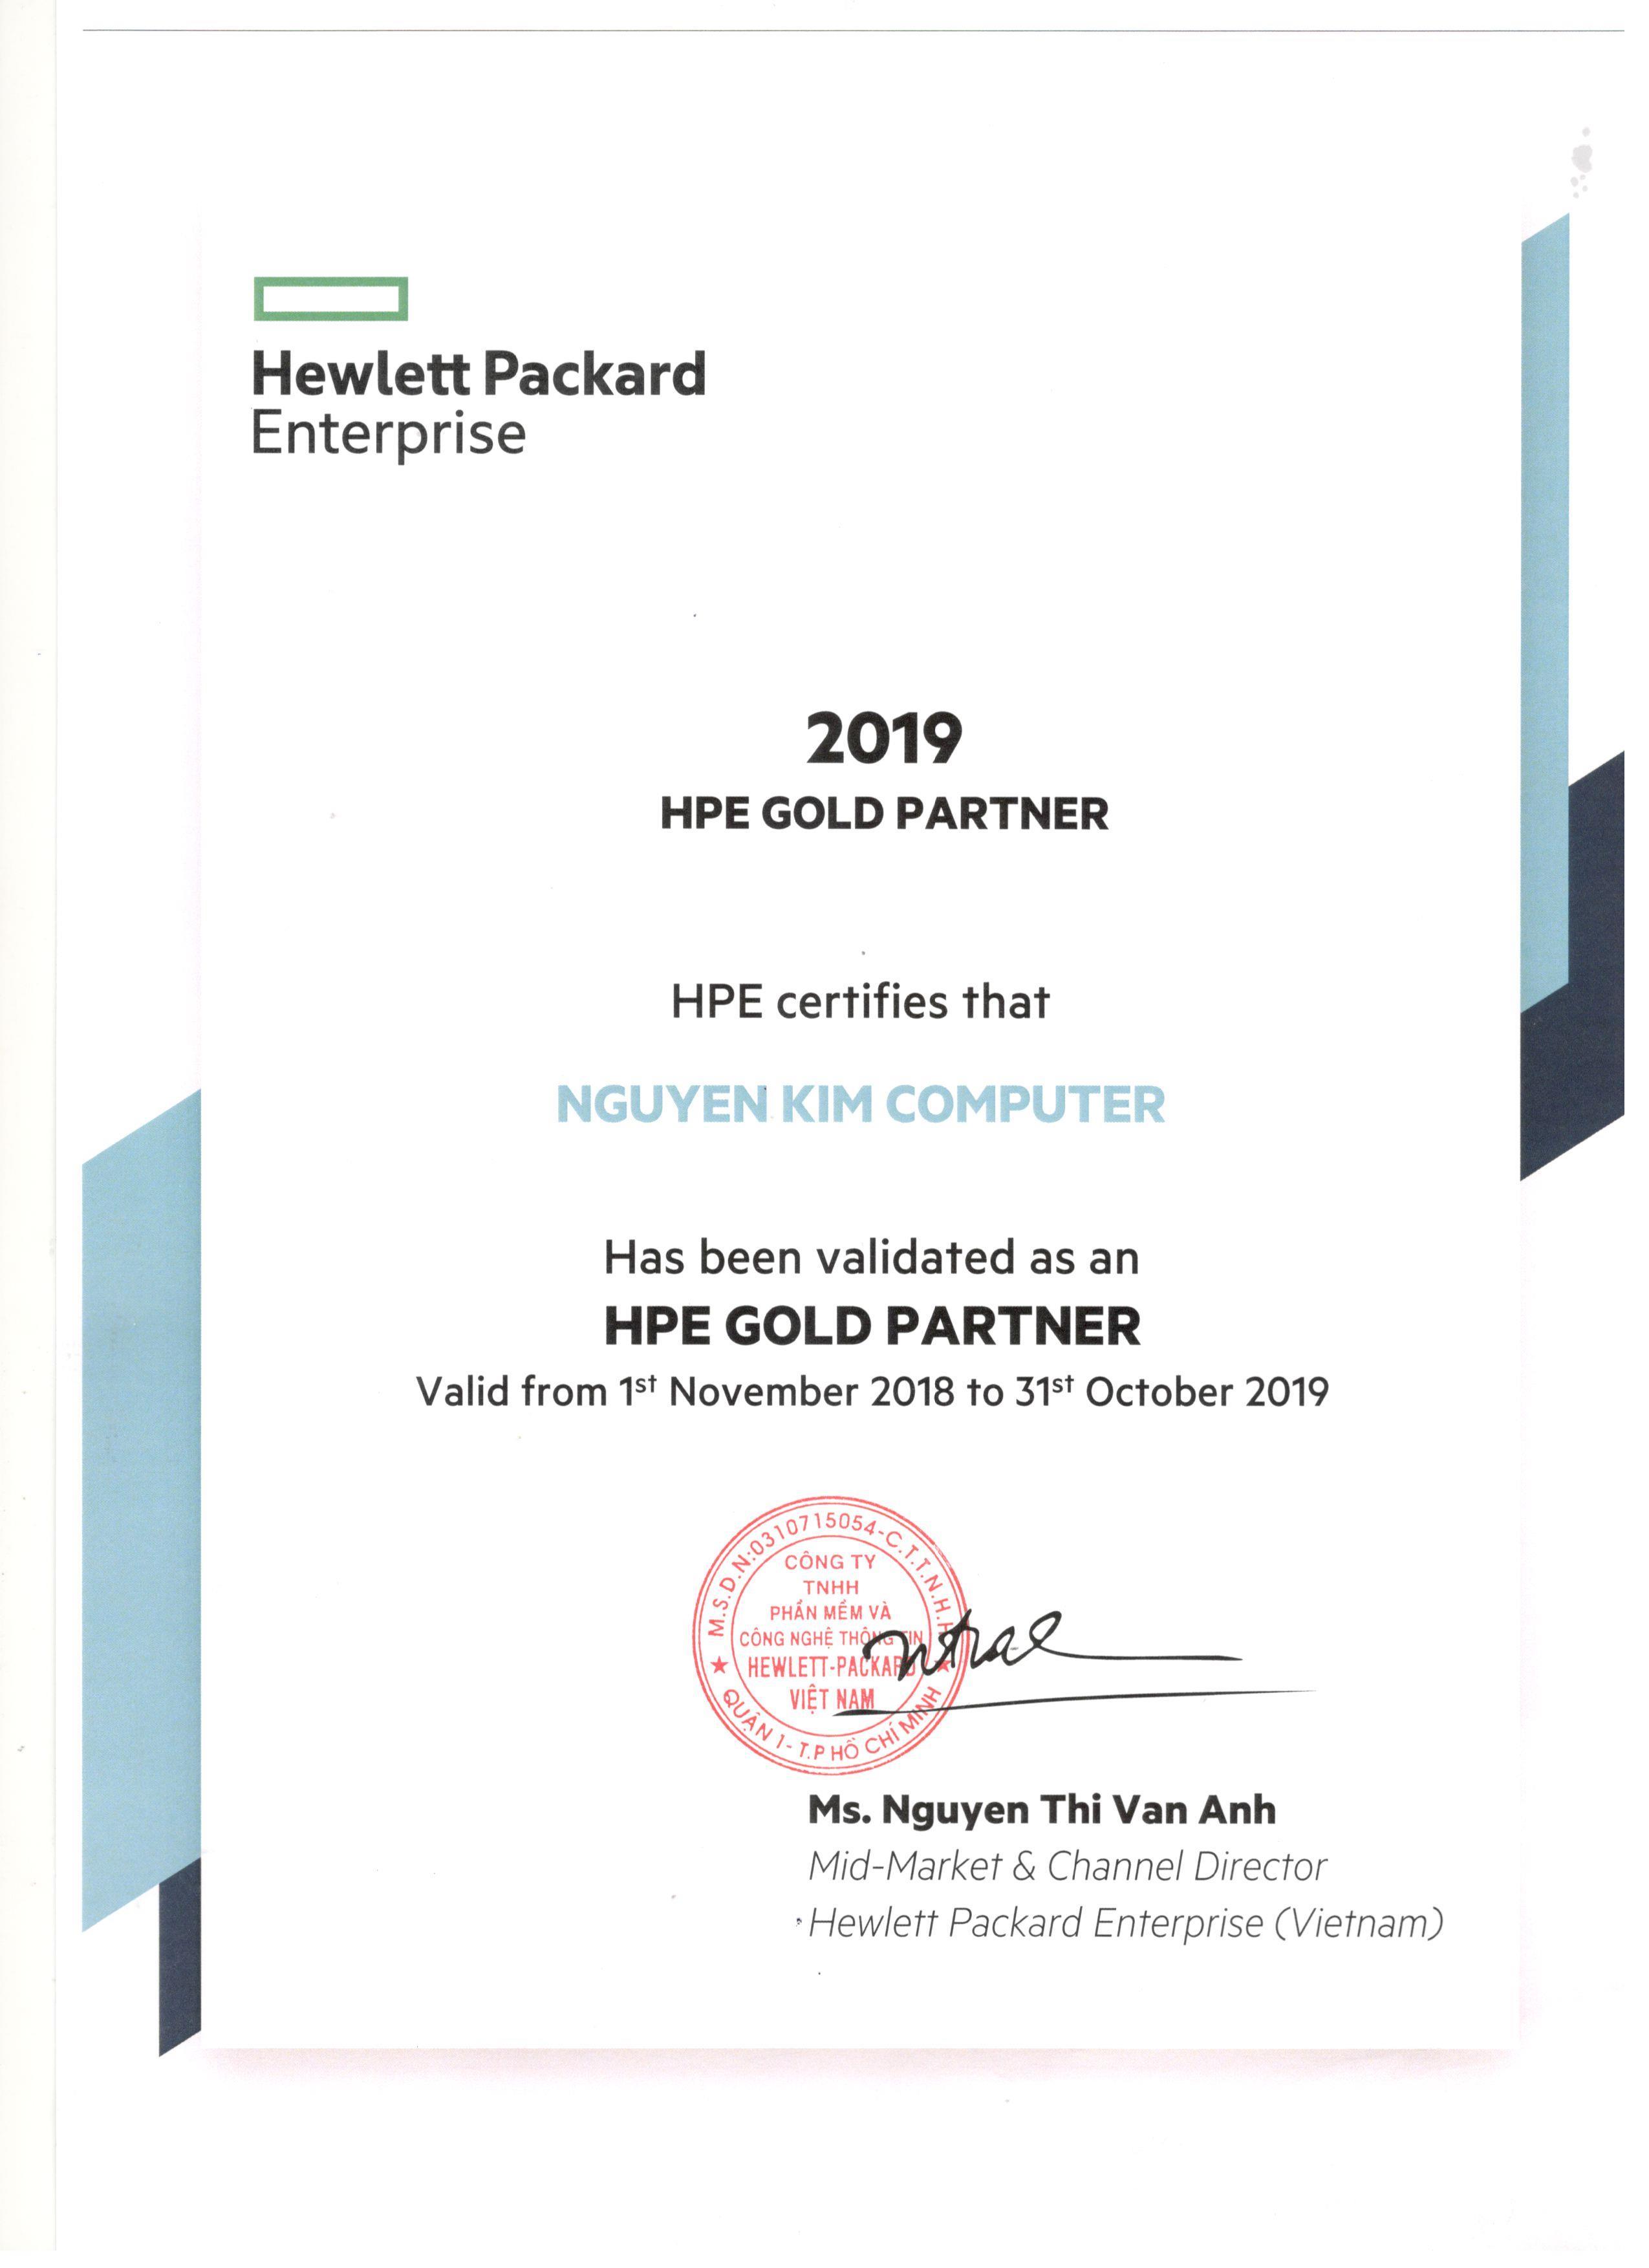 Chứng nhận HPE GOLD PARTNER 2019